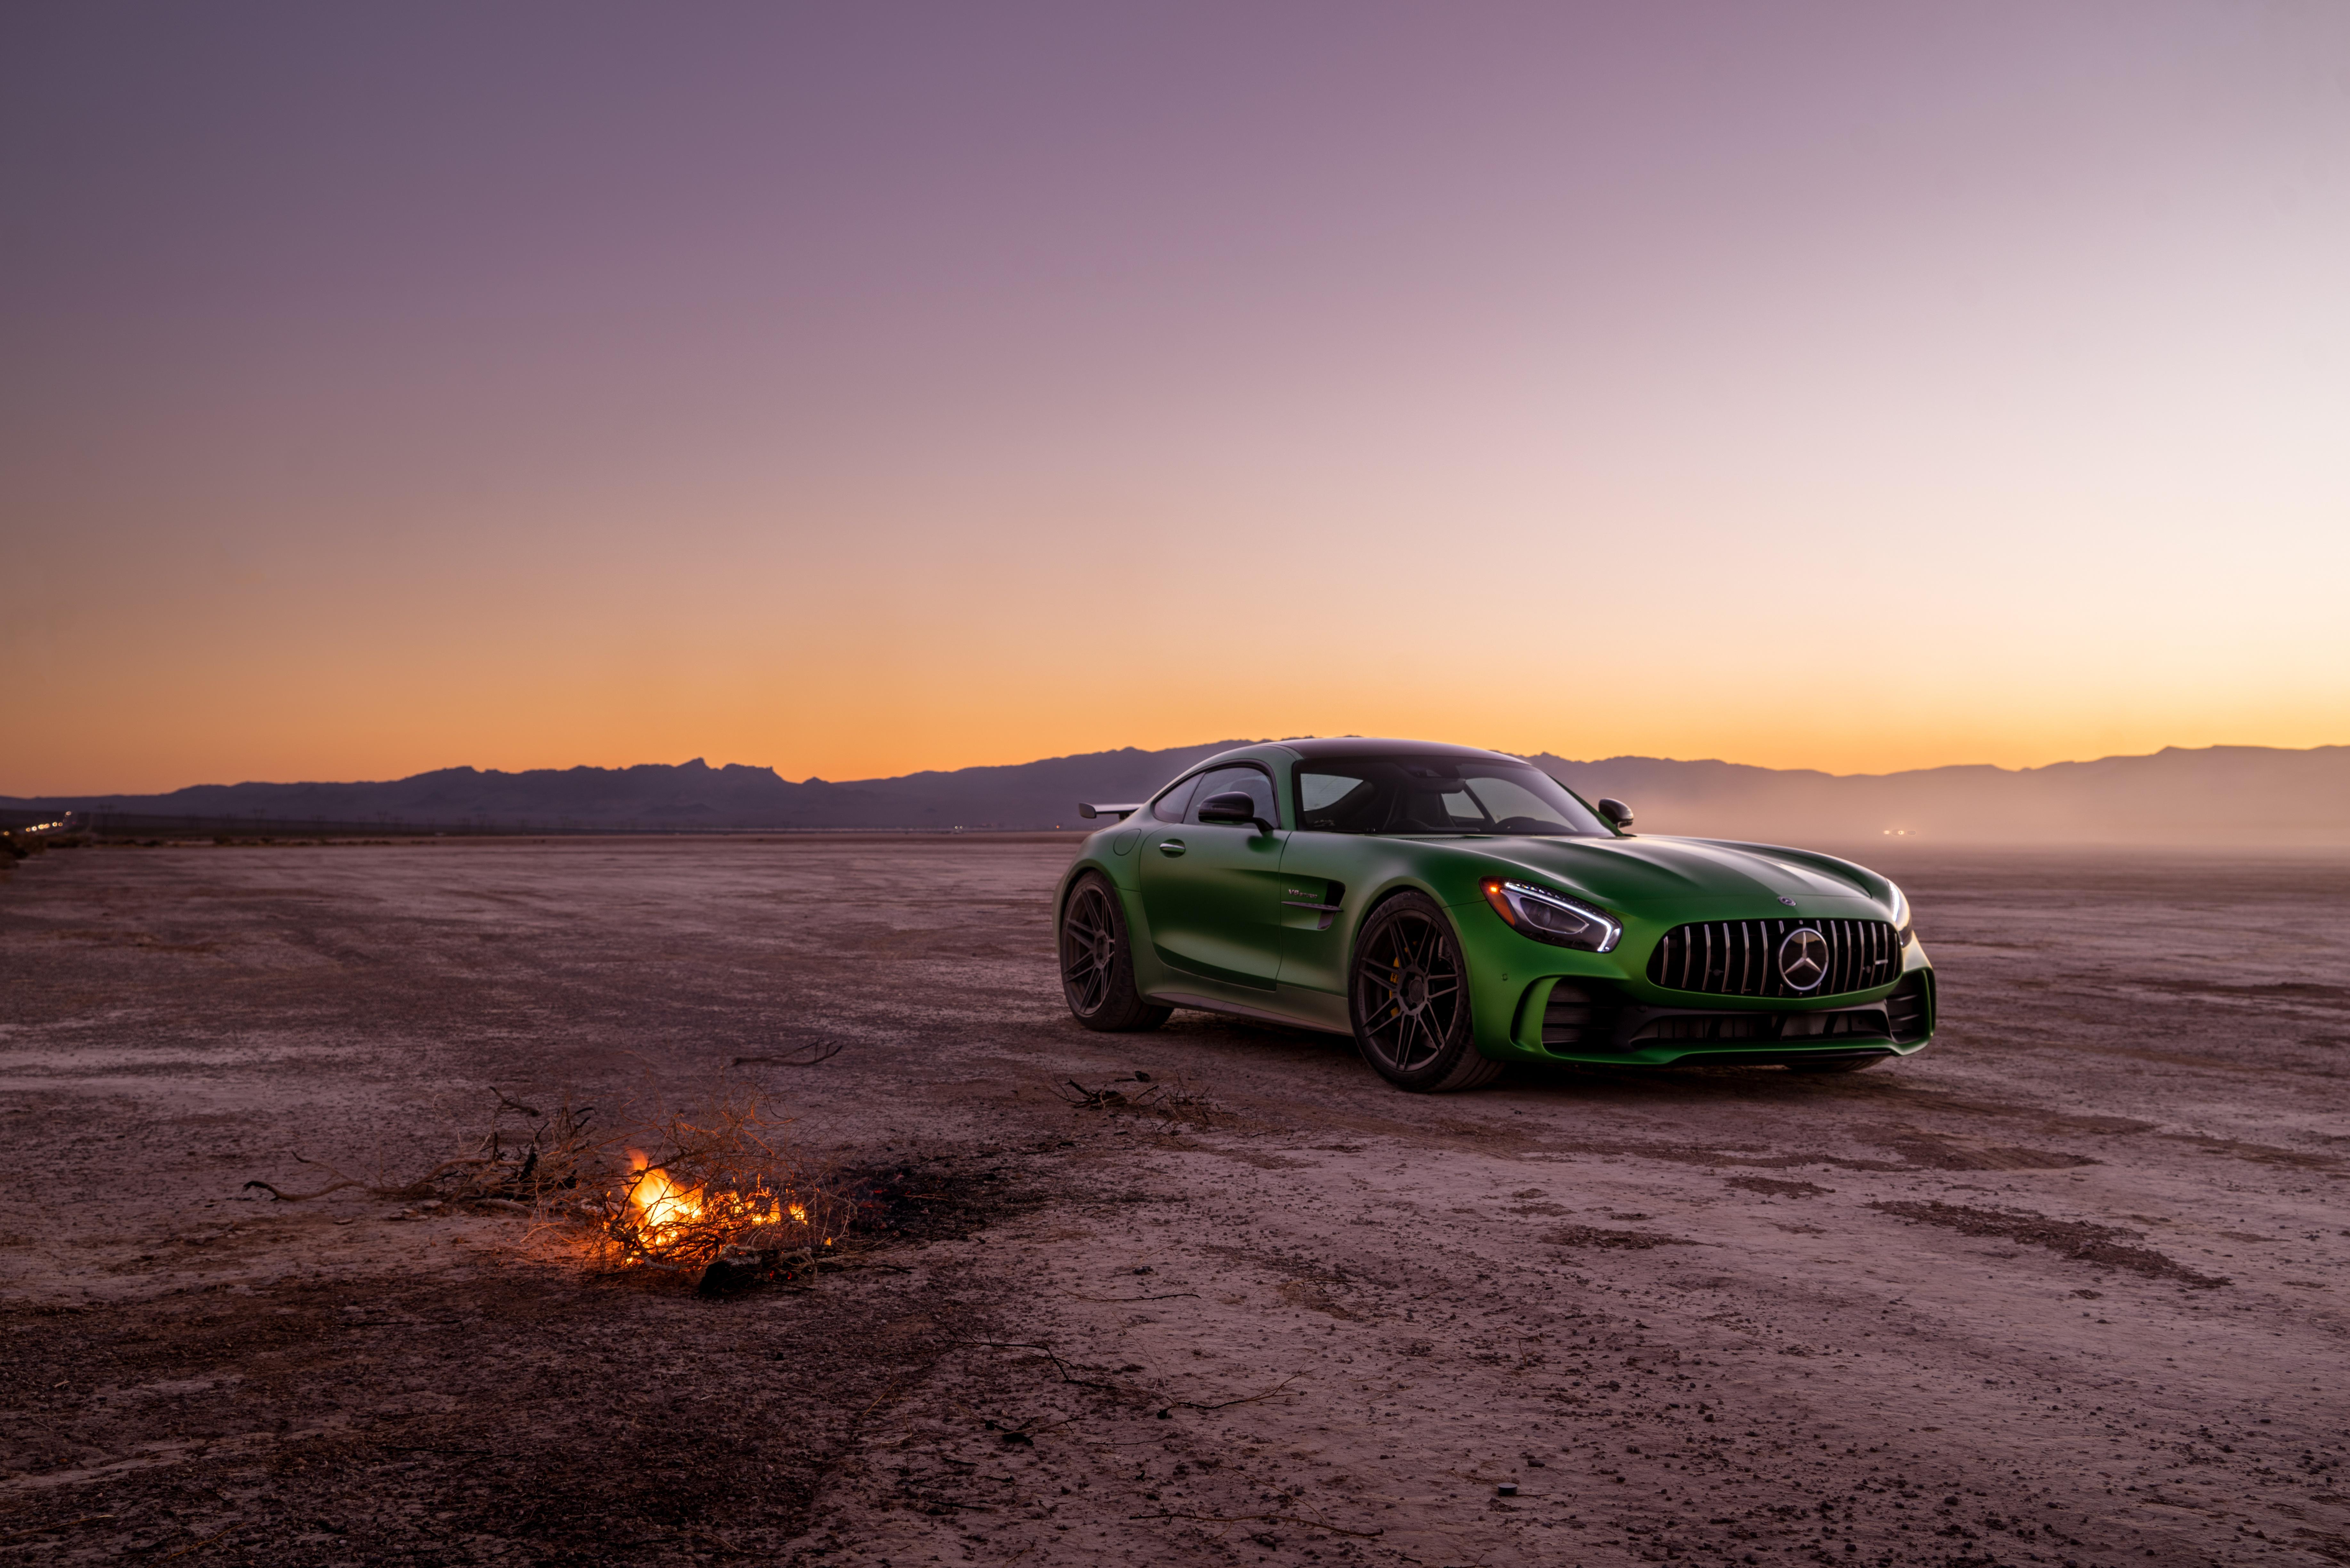 2018 Mercedes Amg Gtr 8k, HD Cars, 4k Wallpapers, Images ...